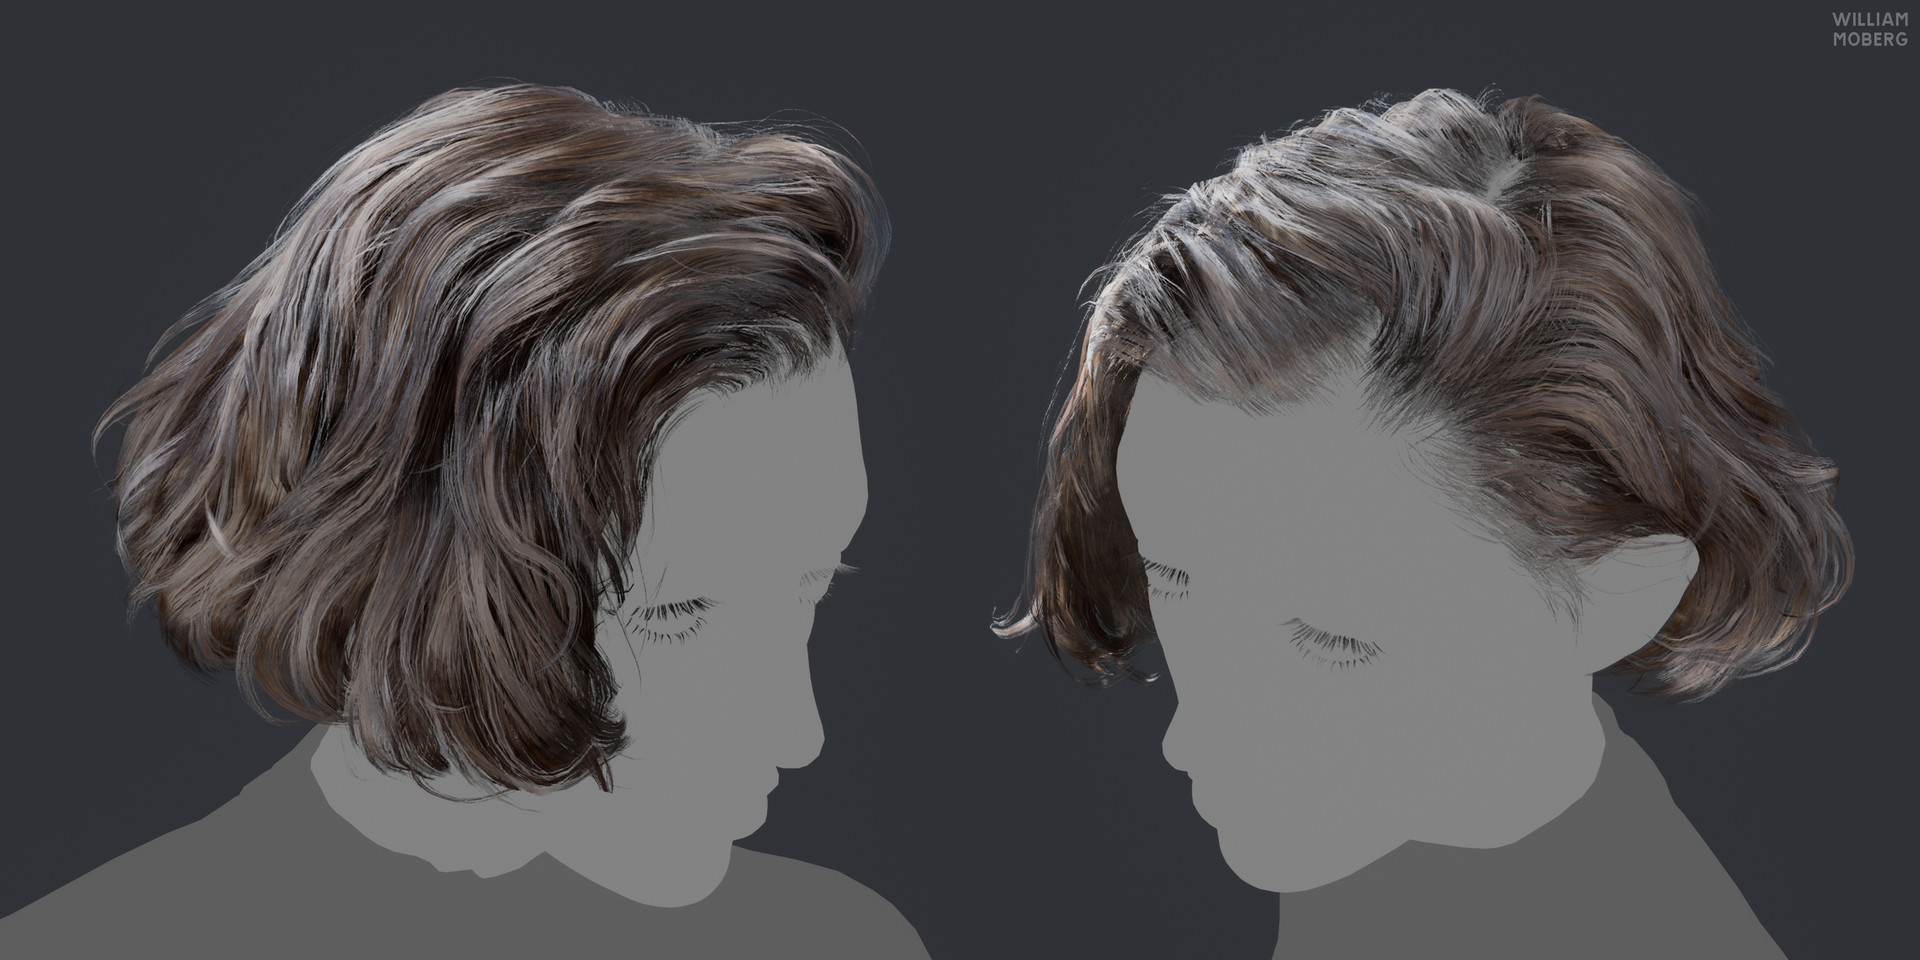 William moberg hair01b